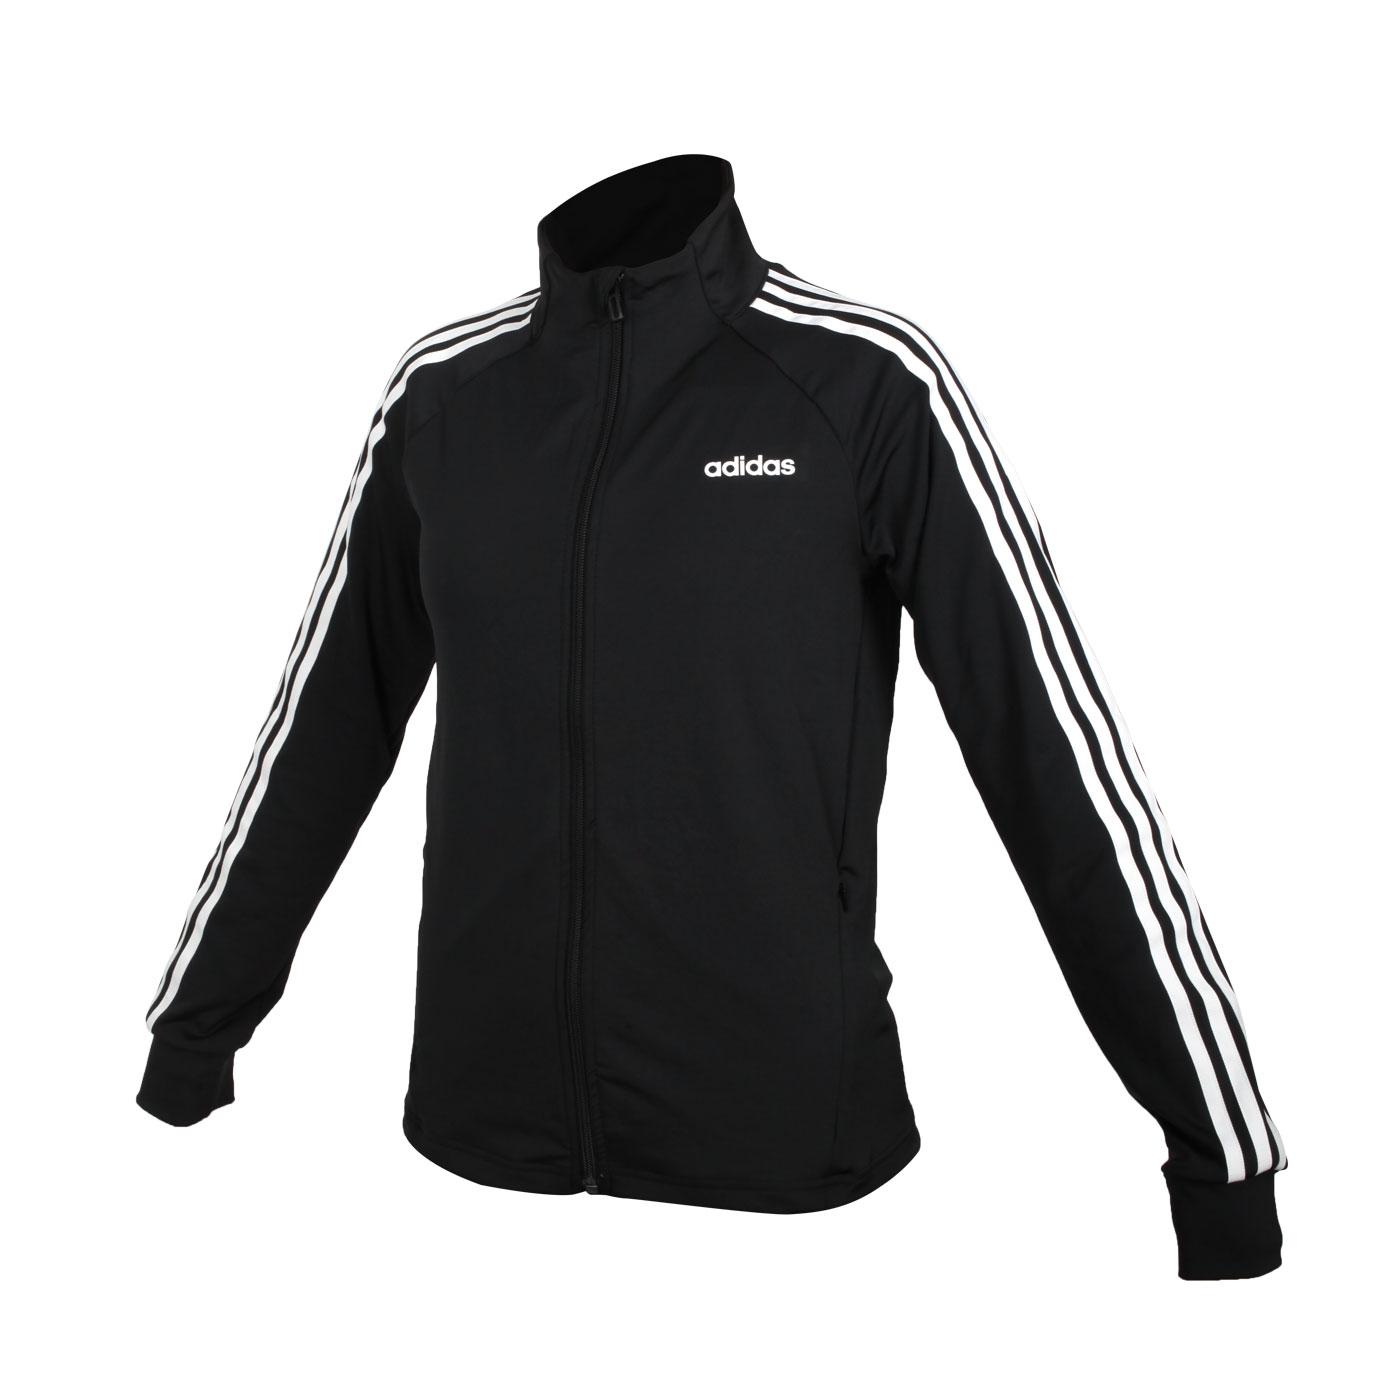 ADIDAS 女款長袖外套 EI5529 - 黑白